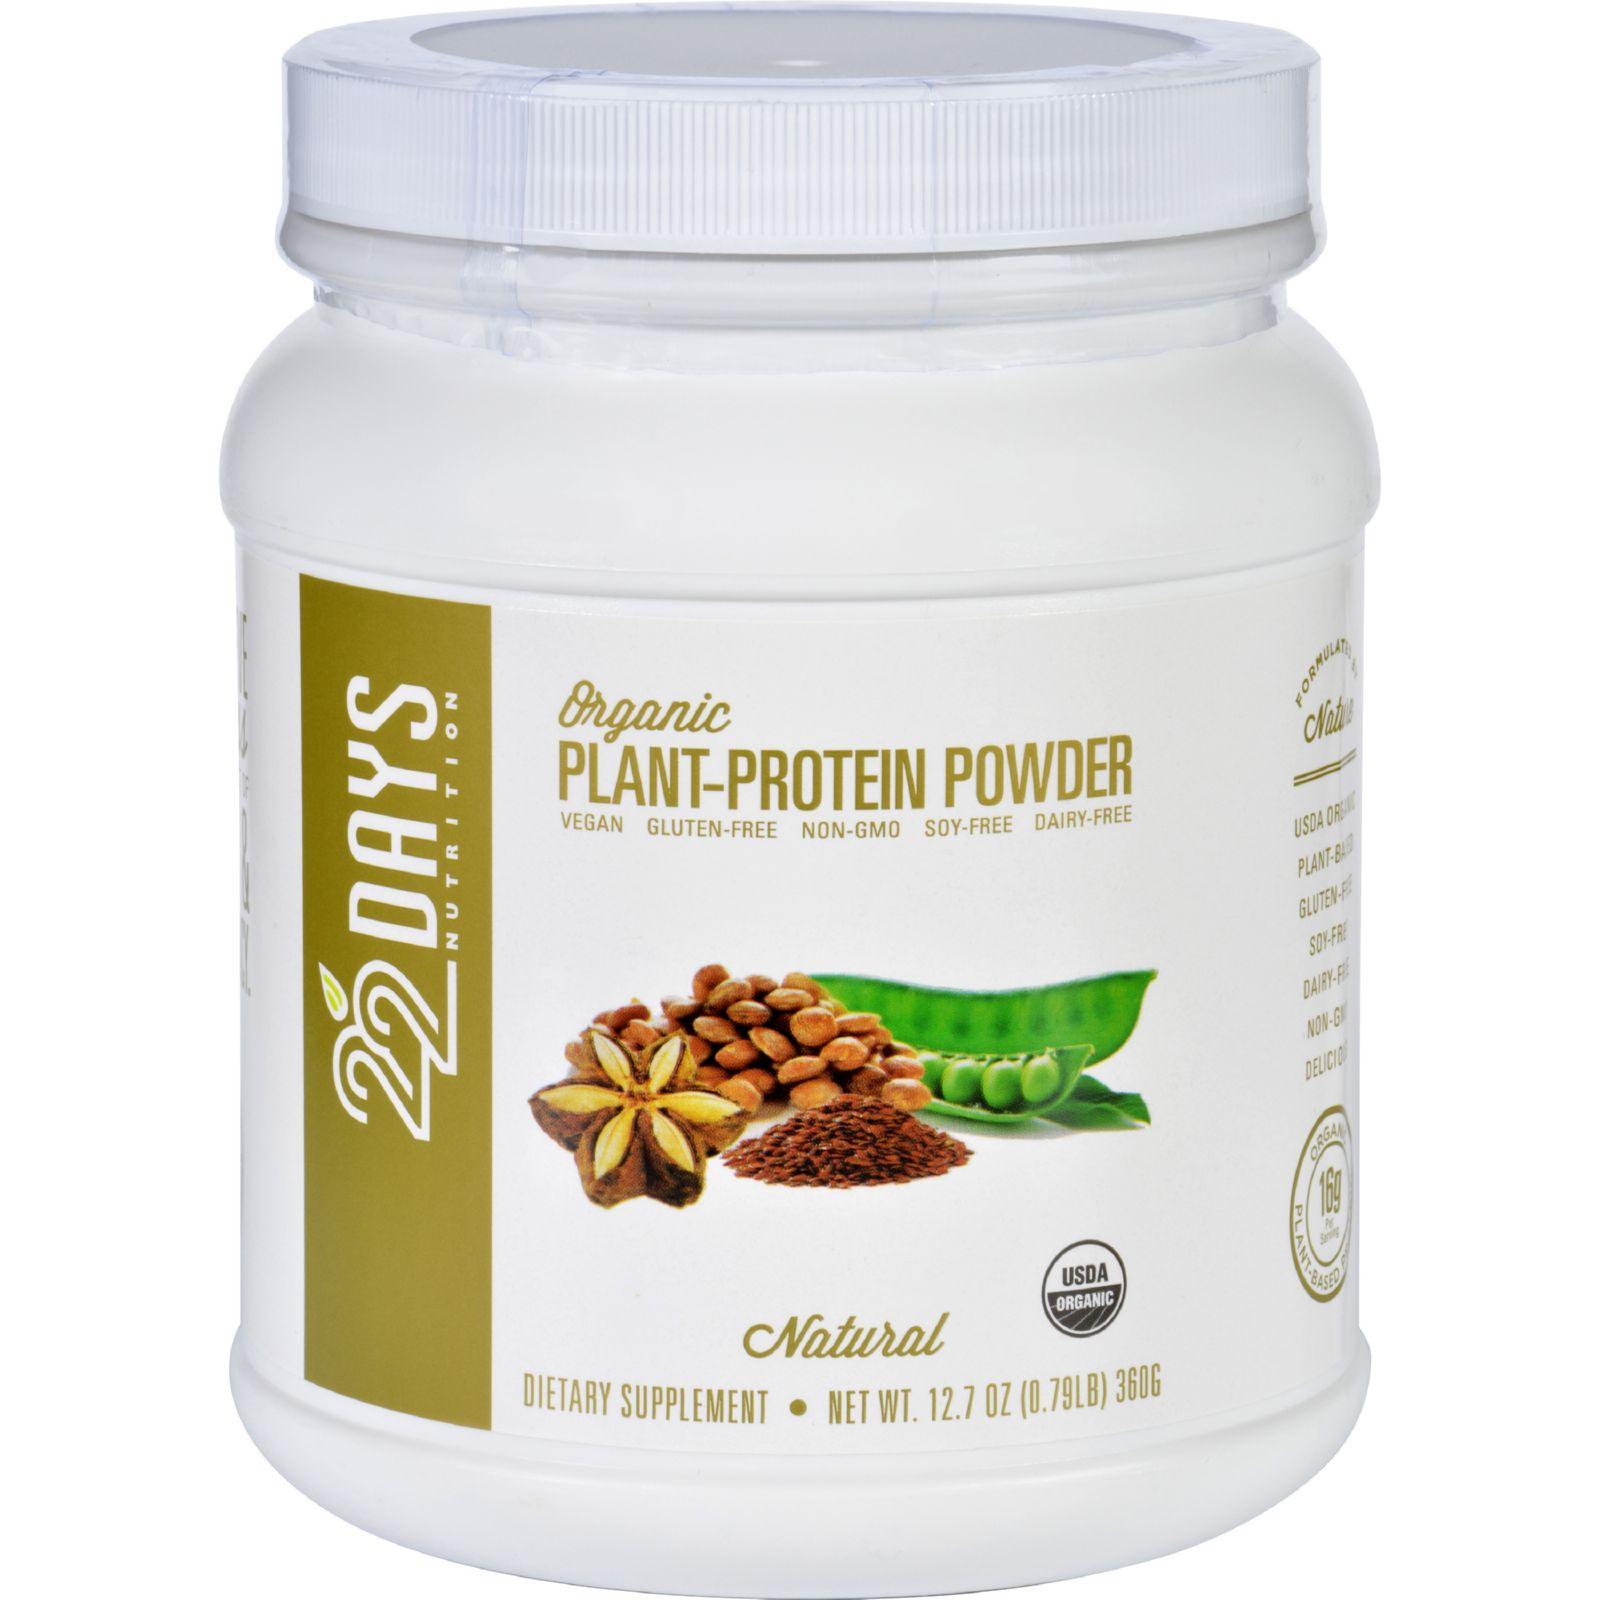 Organic Plant-Protein Powder 12.7 oz Powder  Natural